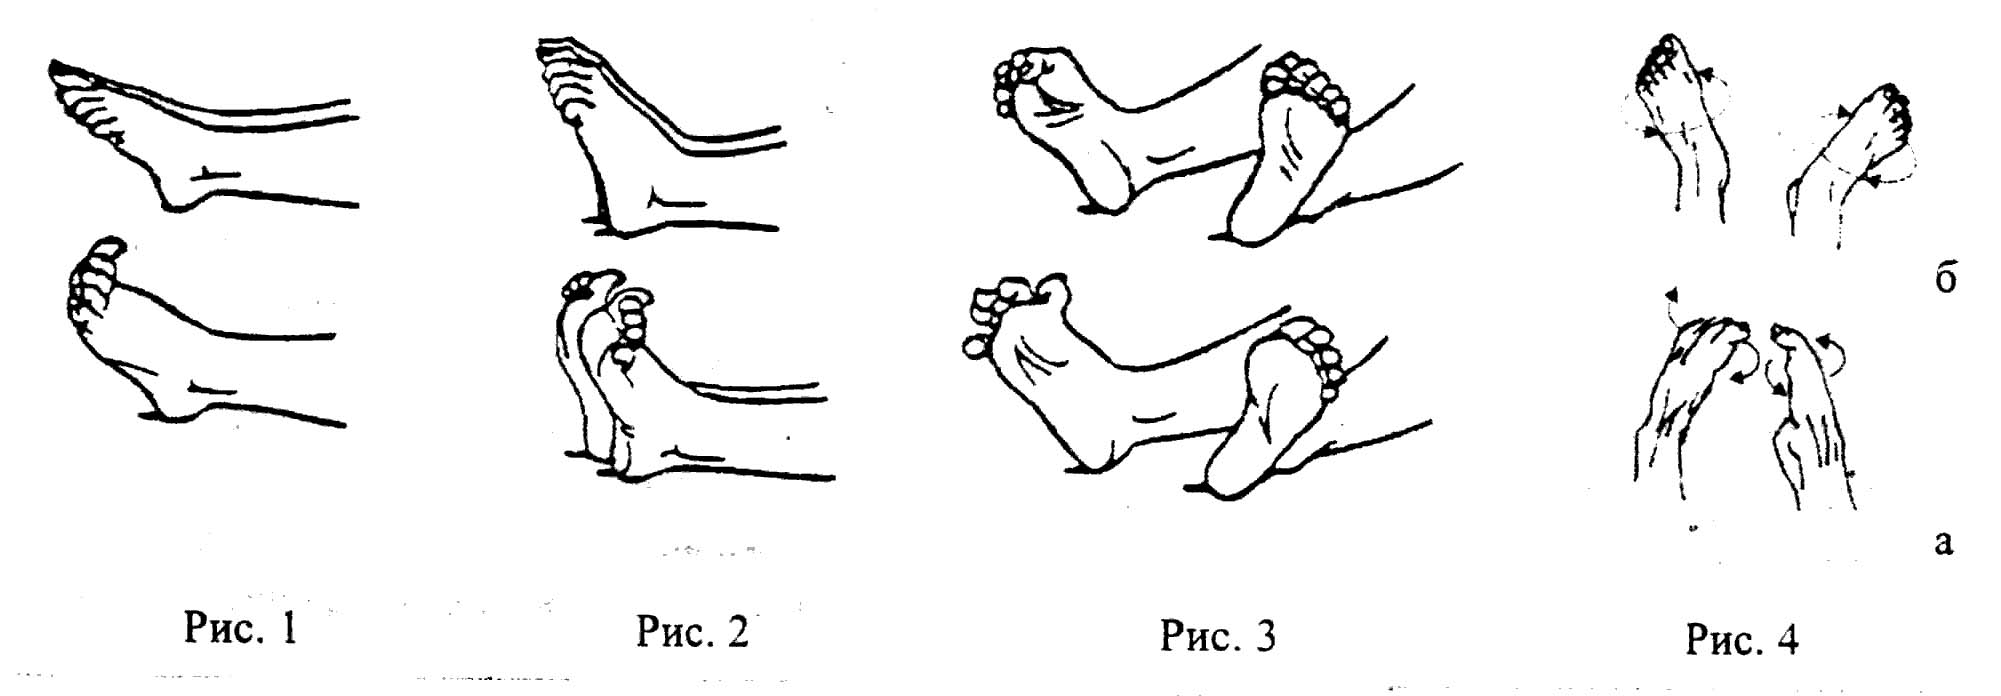 5 причин боли в пятке при ходьбе и лечение